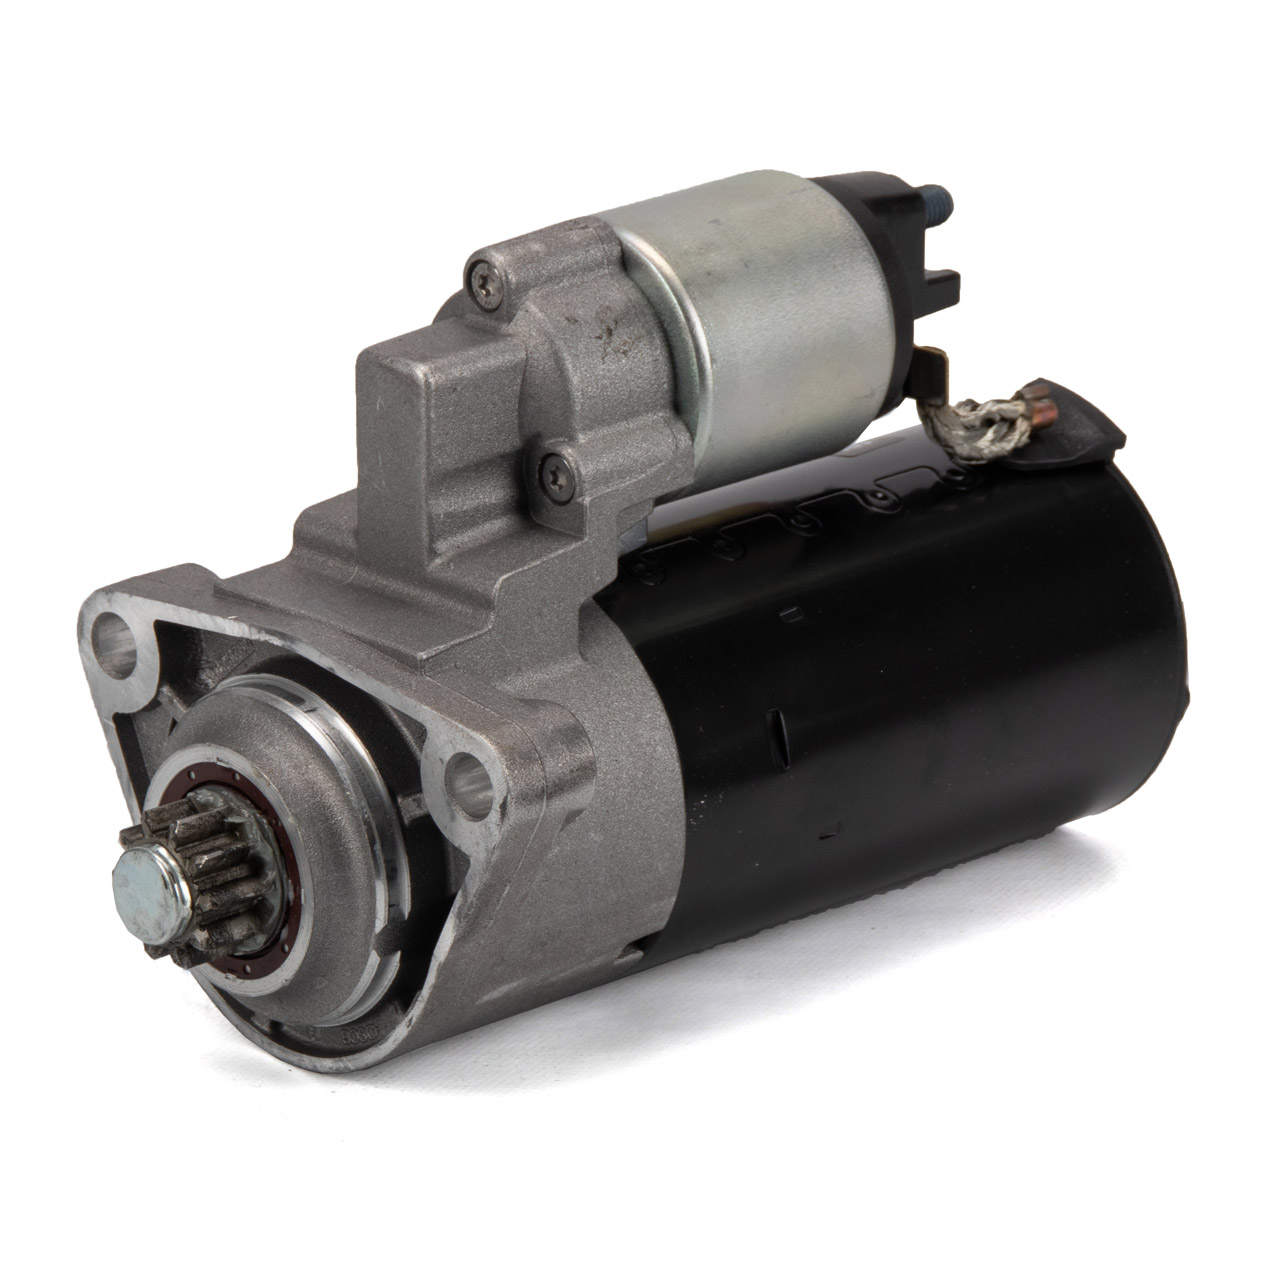 BOSCH 0001125024 Anlasser Starter 12V 1,9kW PORSCHE Cayenne 9PA S / Turbo 4.5